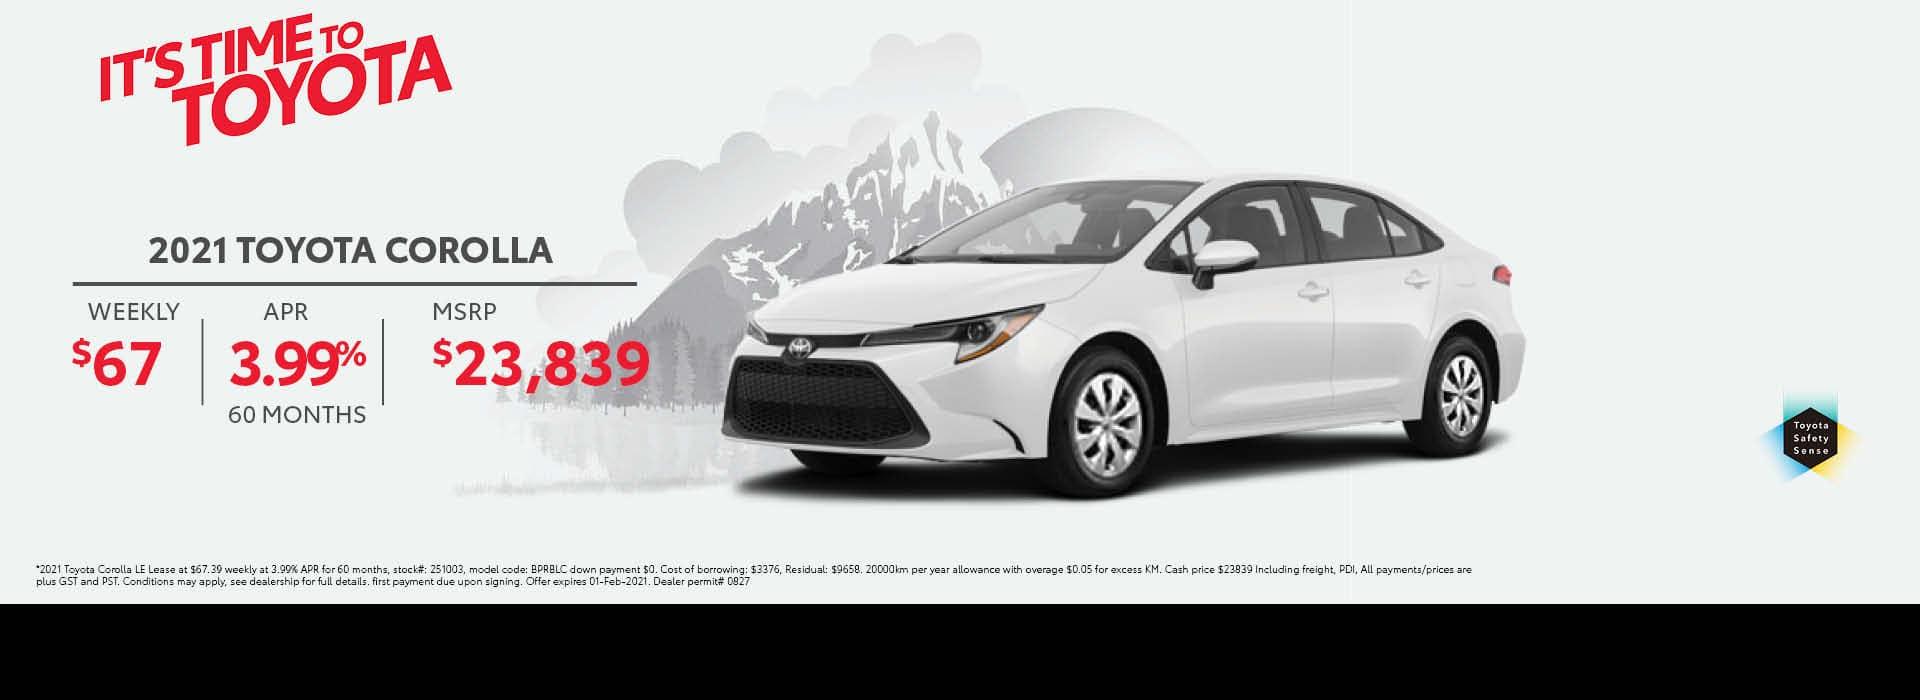 2021_Toyota_Corolla_Desktop_Jan2021